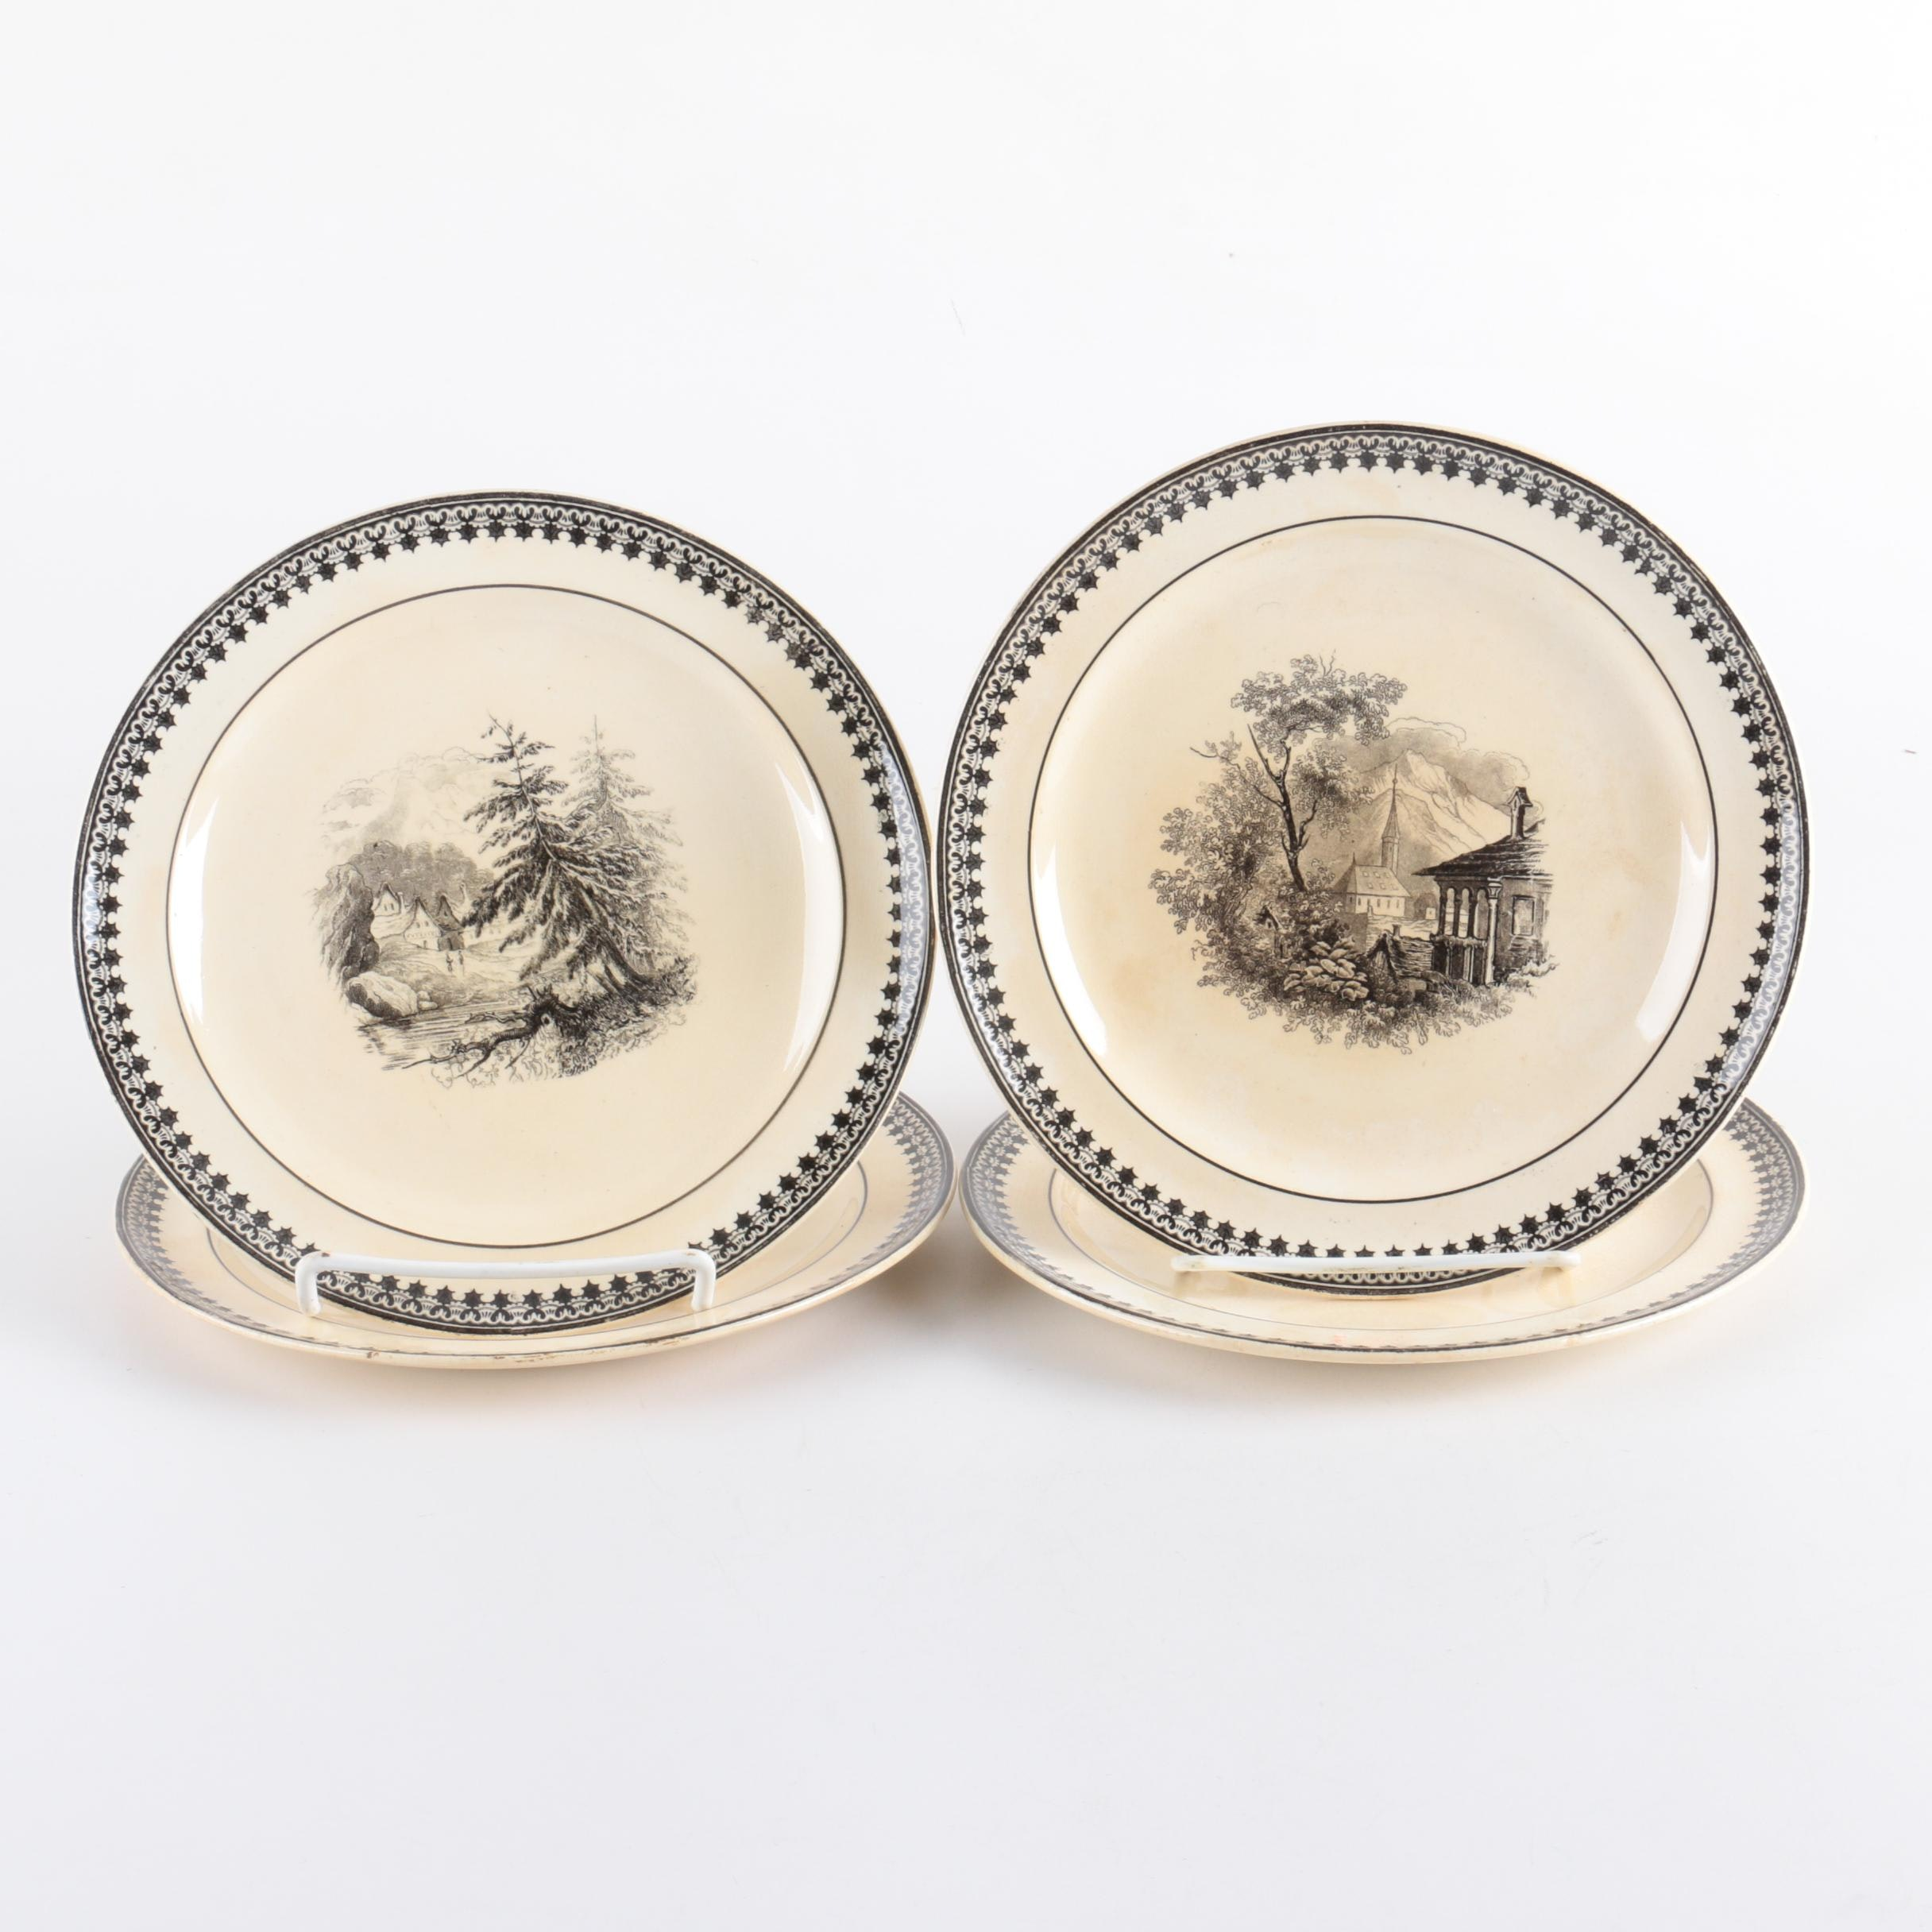 "Villeroy & Boch Old Abbey Ware ""Alpina"" Decorative Plates"